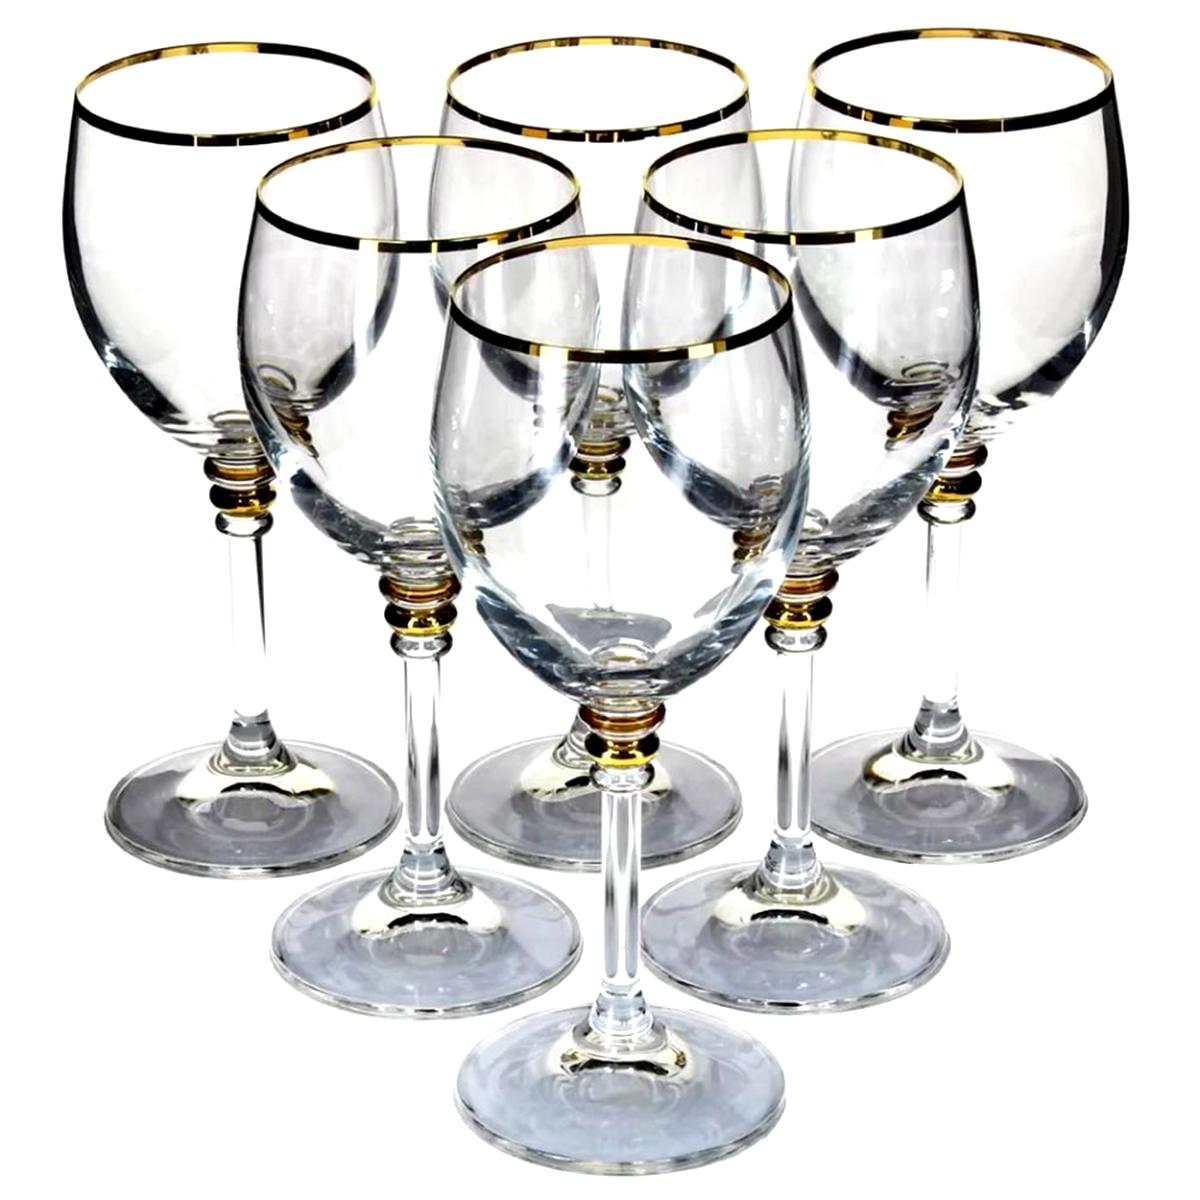 Набор бокалов для вина Bohemia Crystal Оливия, 240 мл, 6 шт набор бокалов для вина bohemia crystal анжела 185 мл 6 шт page 3